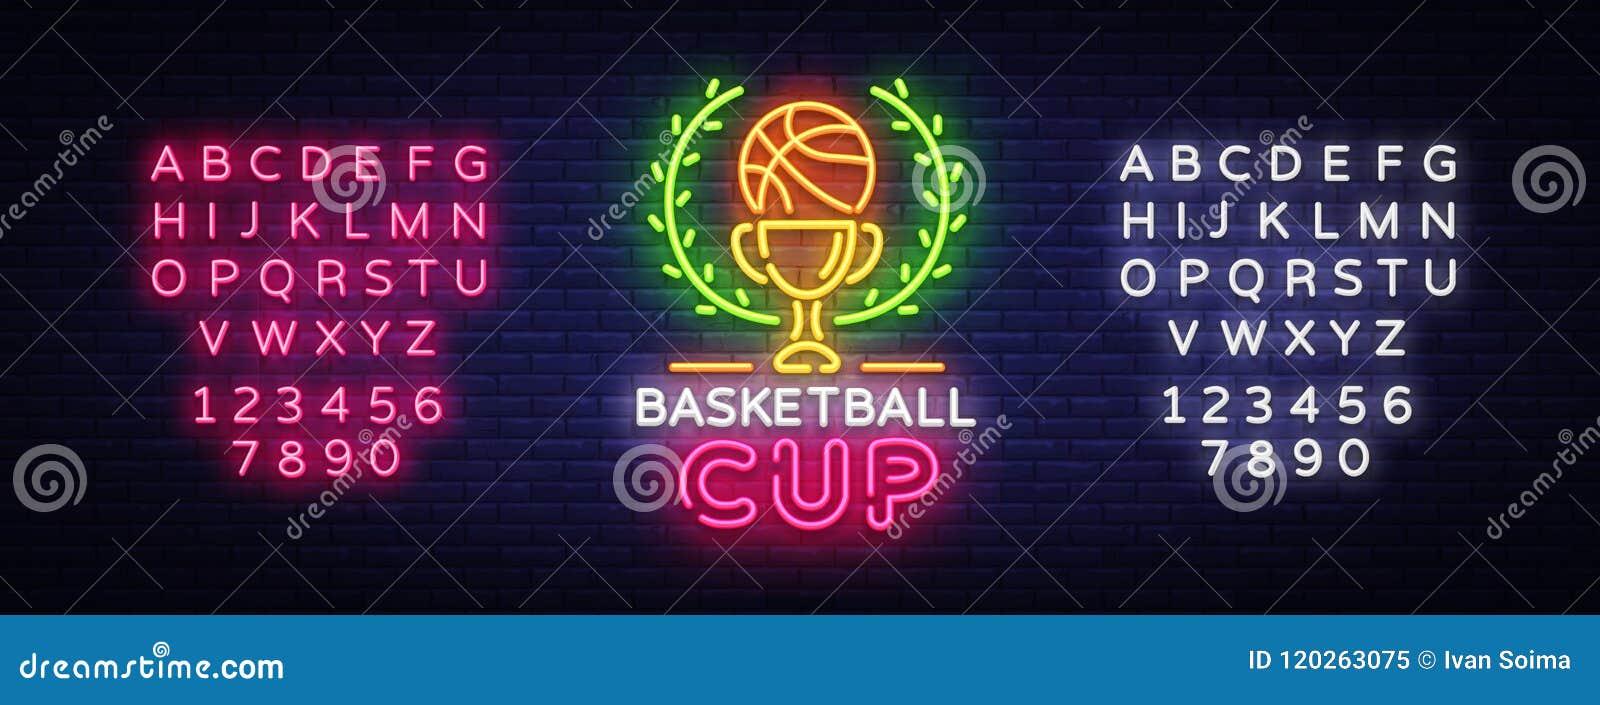 Basketball Tourament Night Neon Logo Vector. Basketball Cup neon sign, design template, modern trend design, sports neon